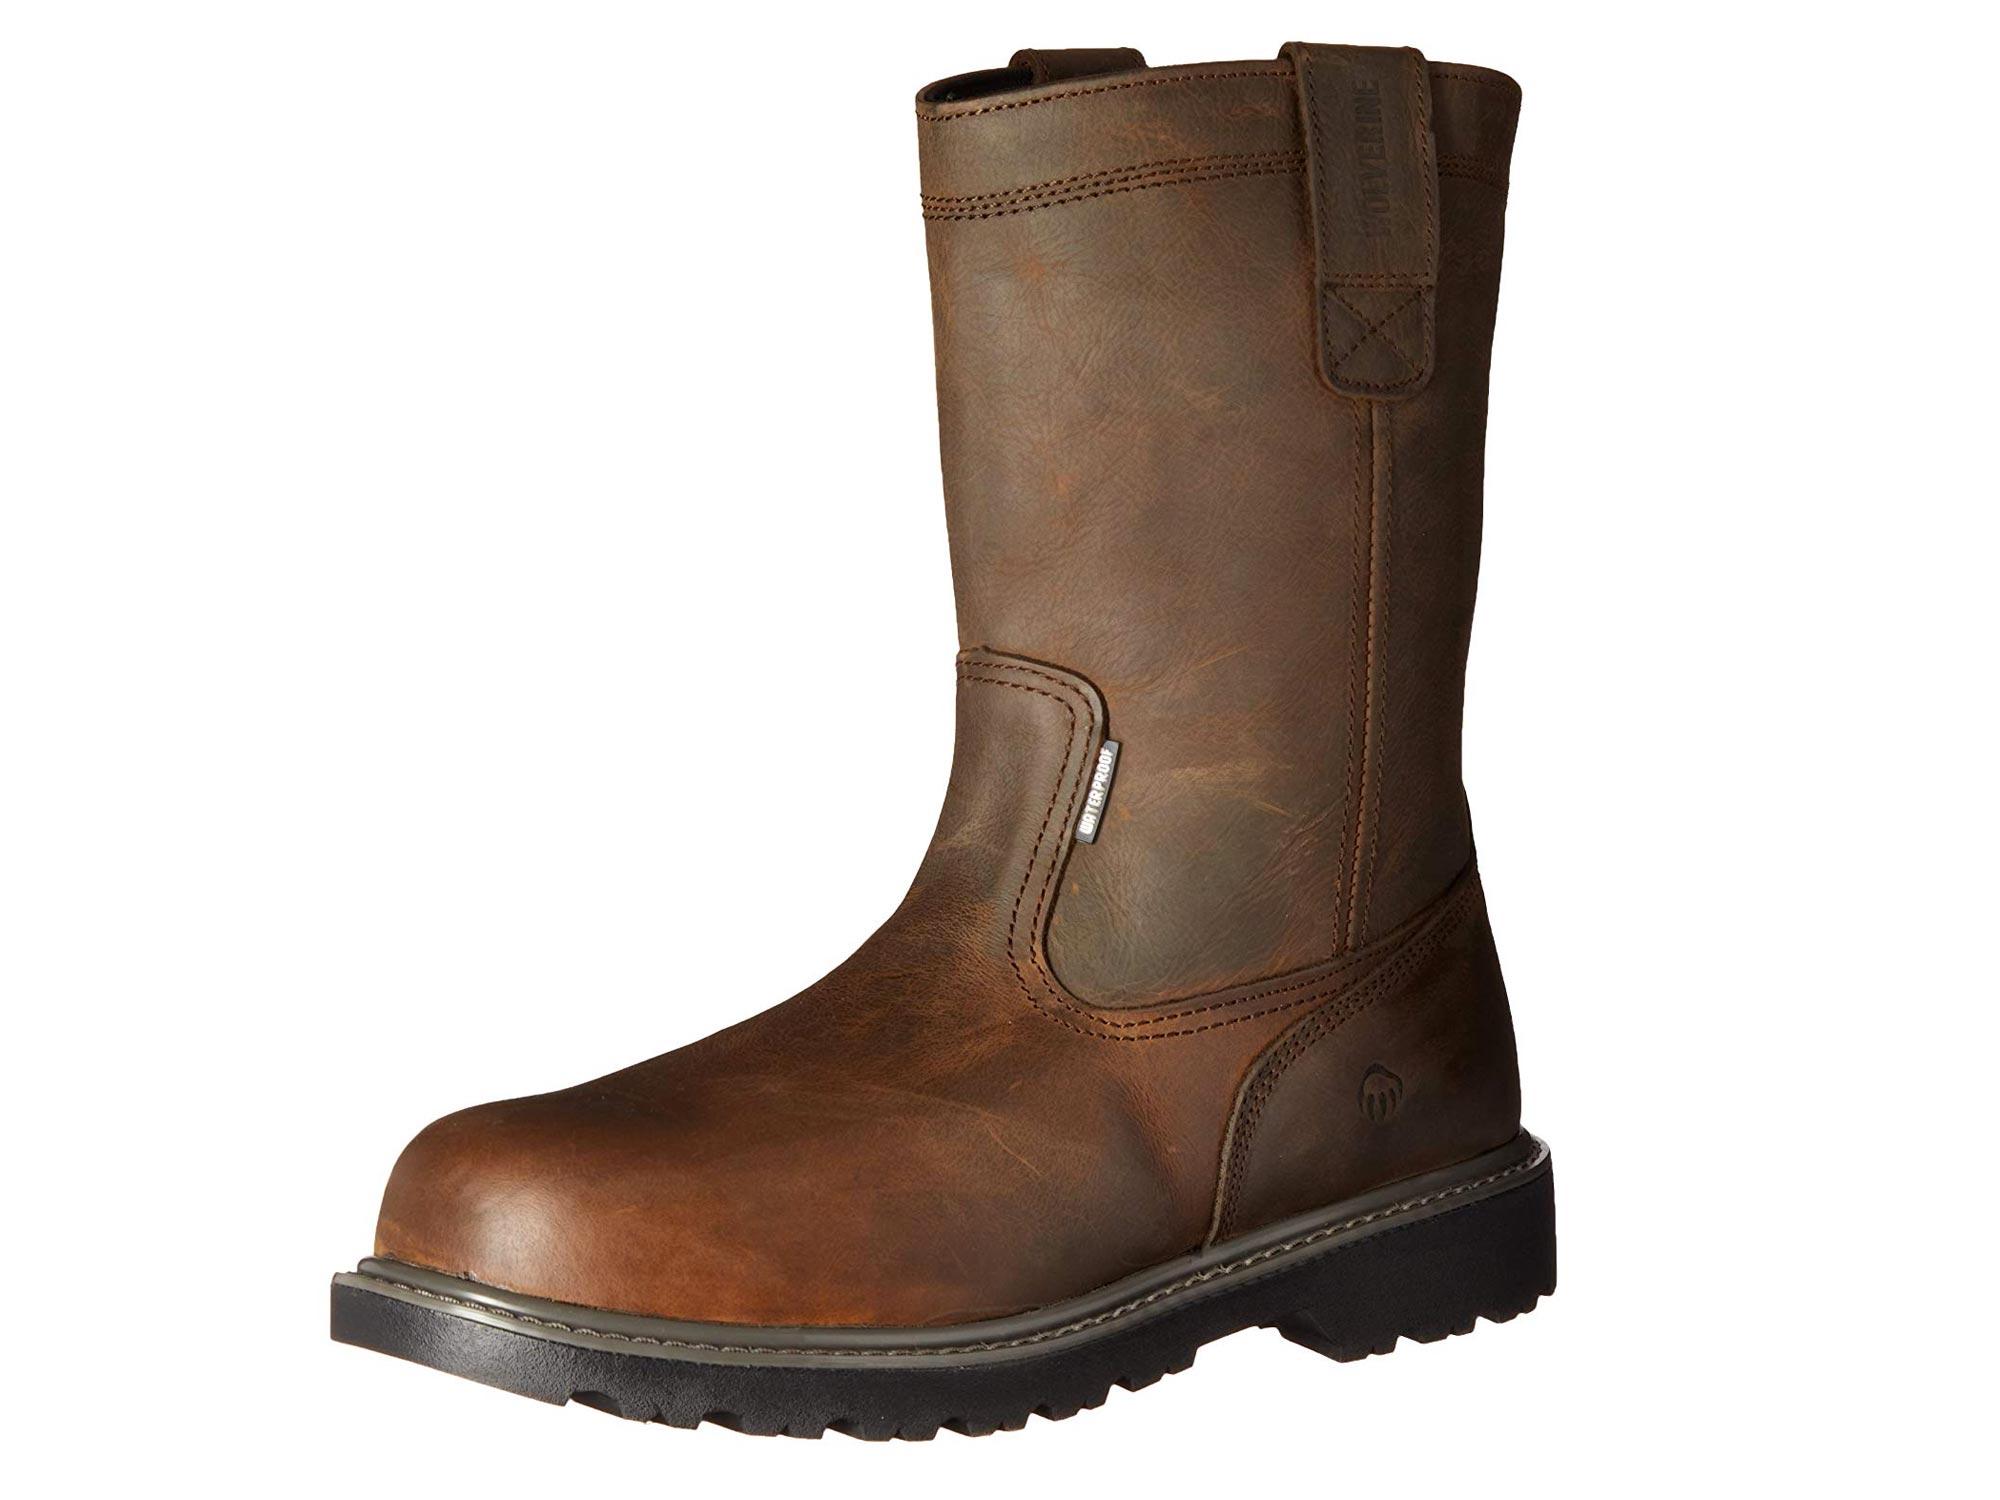 Wolverine steel toe slip on boot